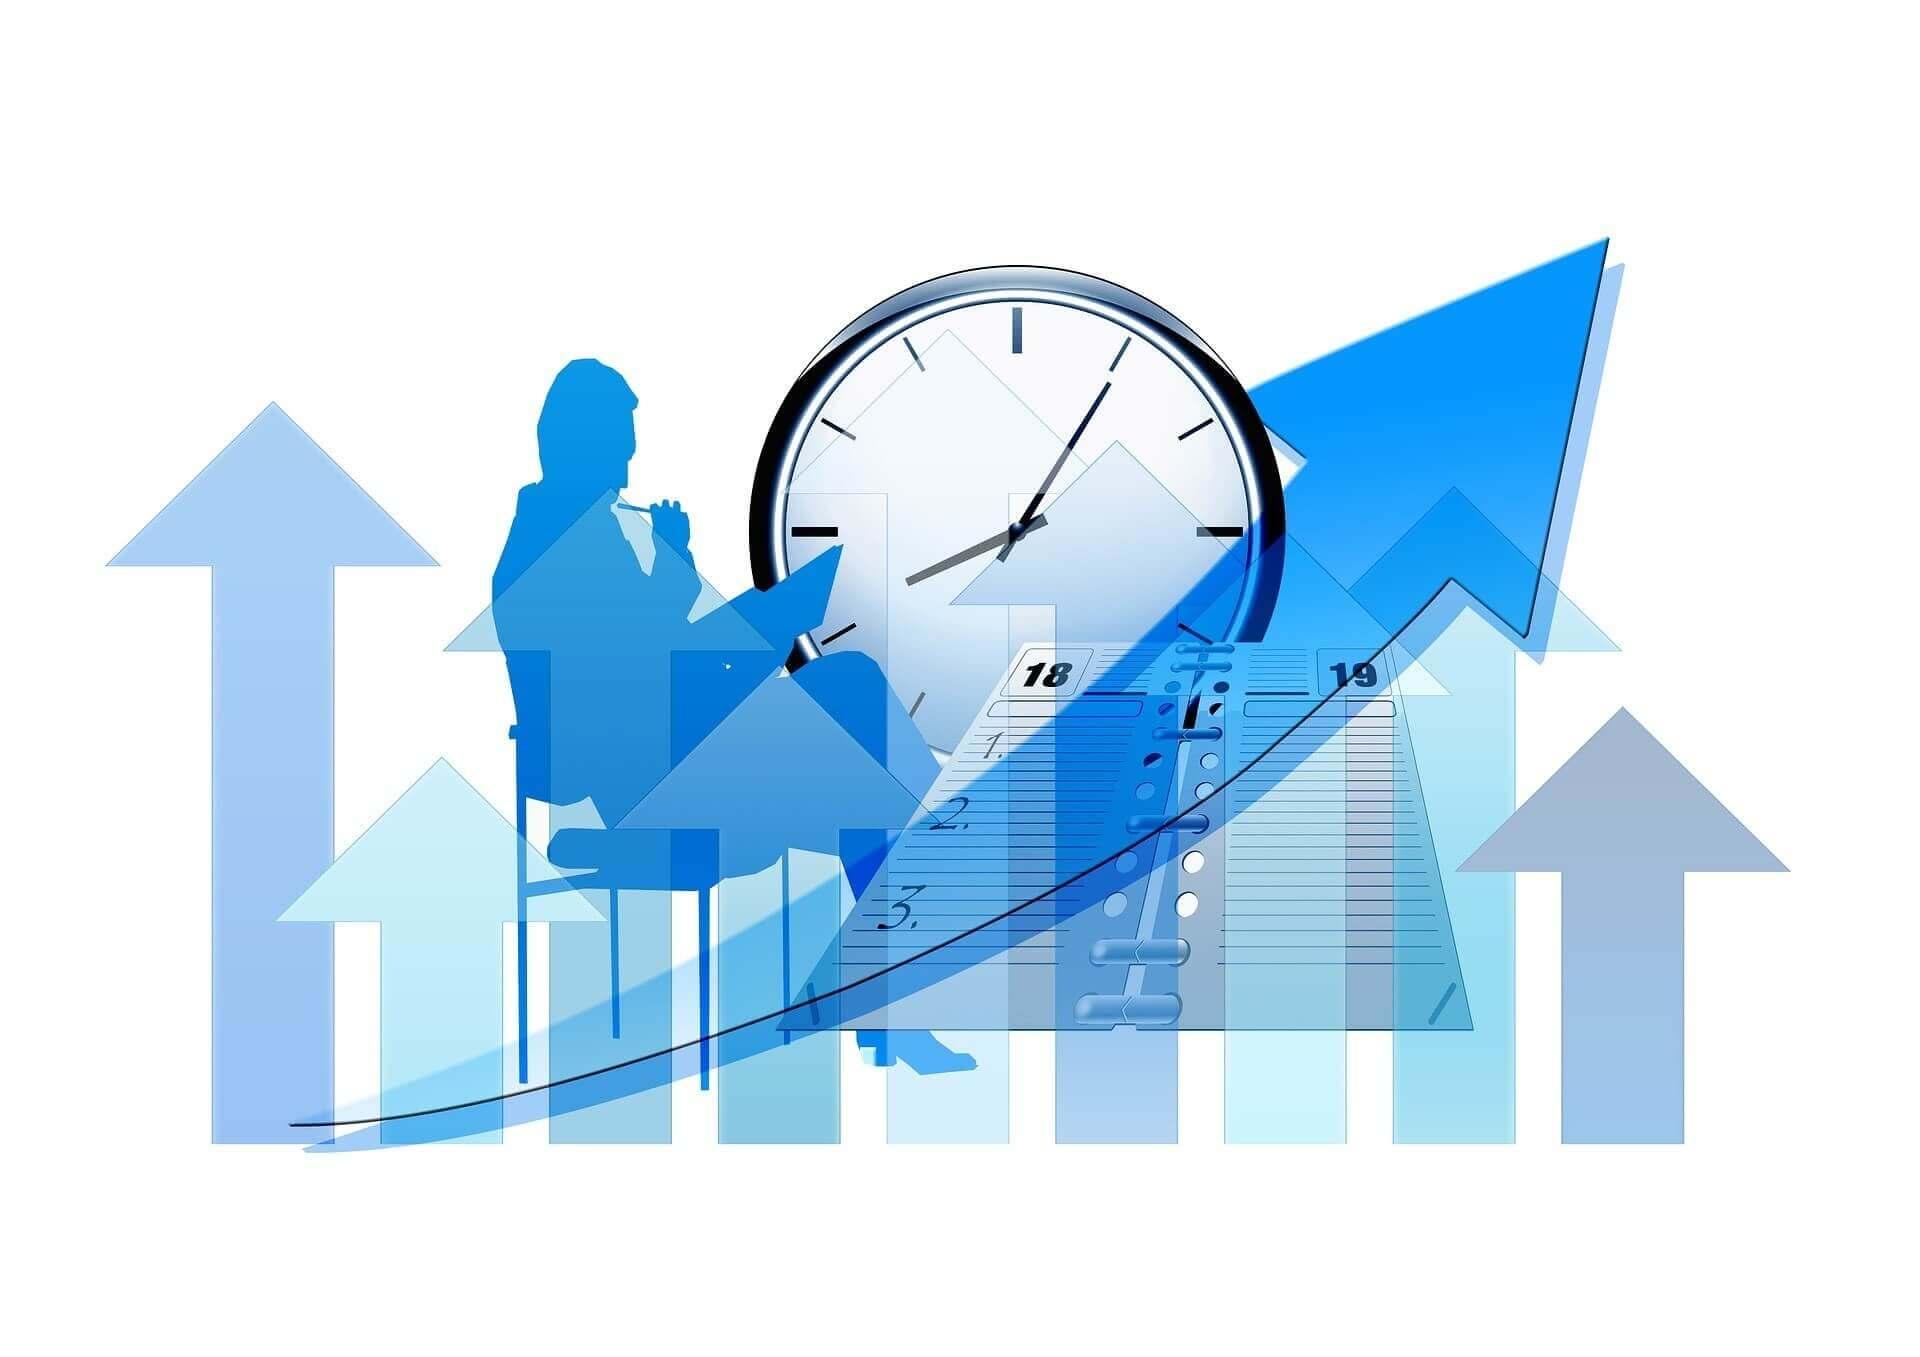 Maximizing Efficiency - The Value Of Standardized Legal Billing Data